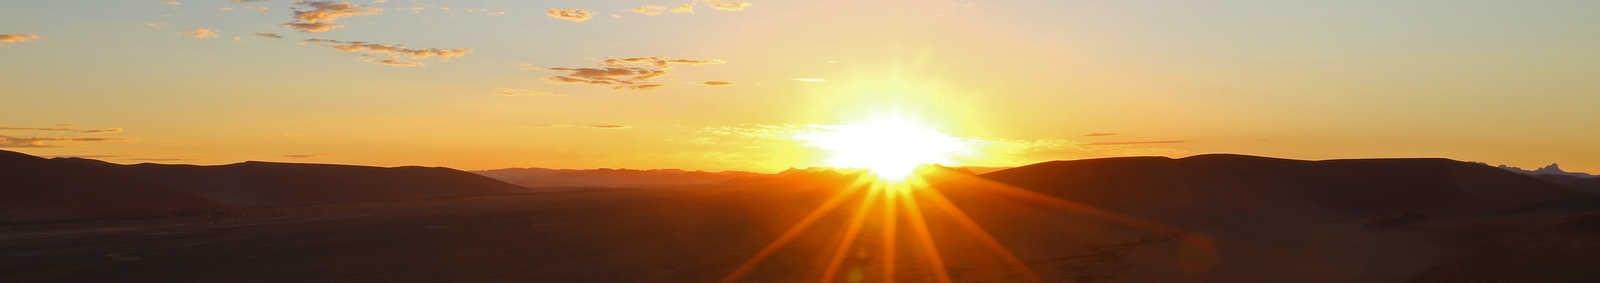 Sunset at the Namib Desert